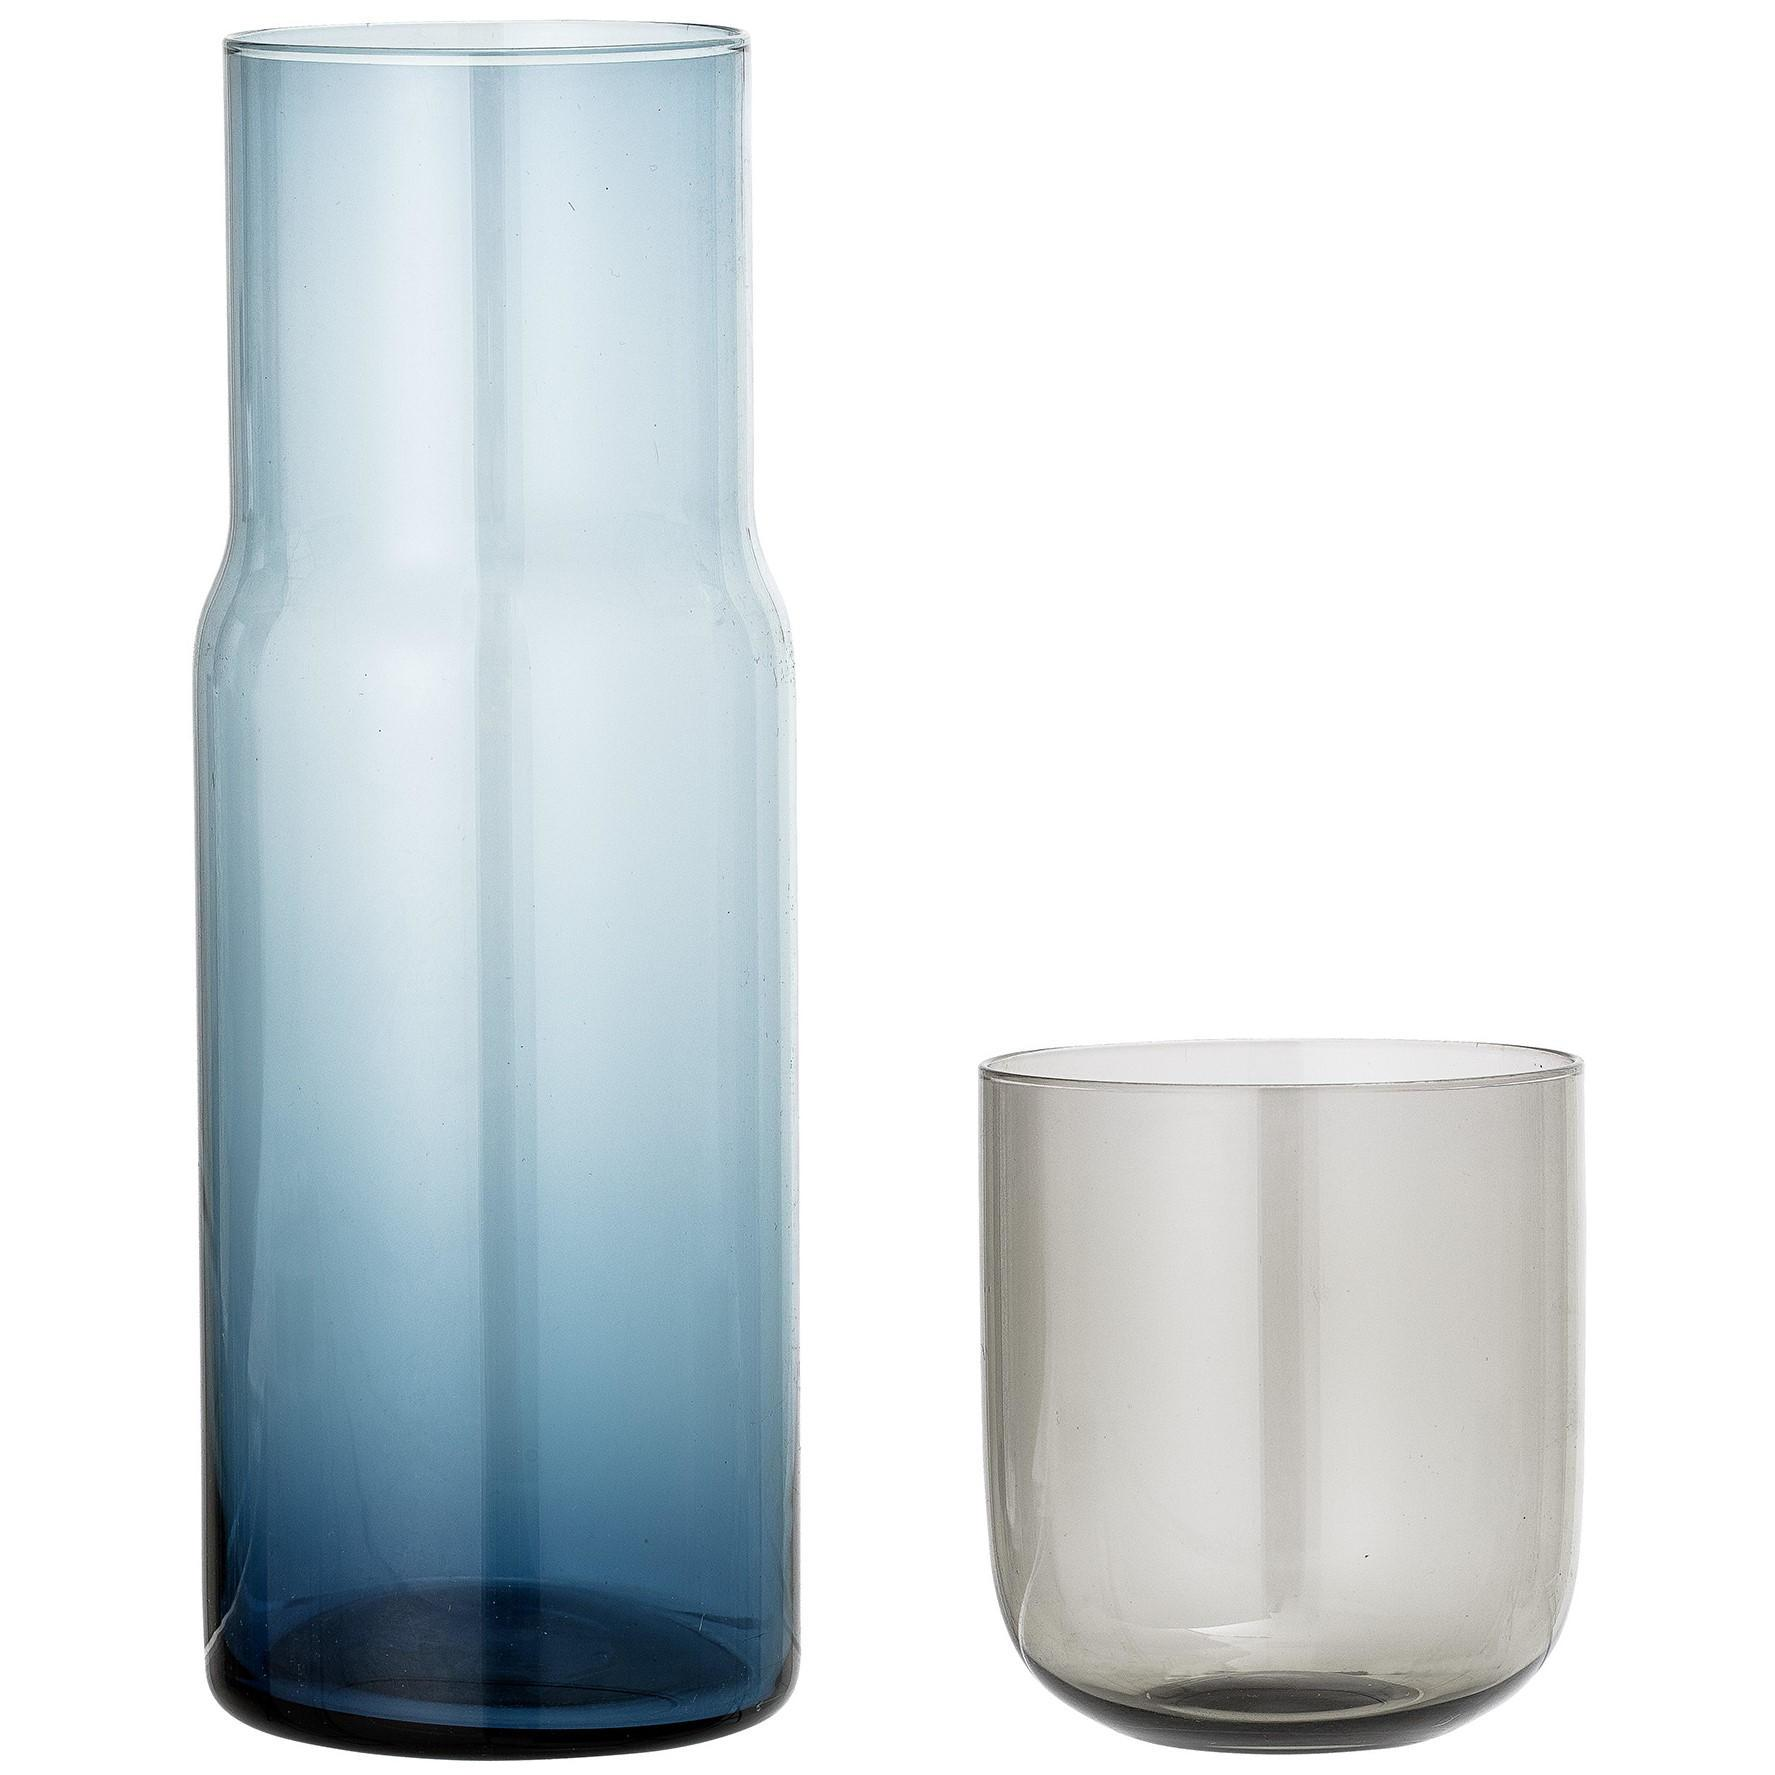 Bloomingville Skleněná karafa se sklenicí Decanter & Glass, modrá barva, šedá barva, sklo